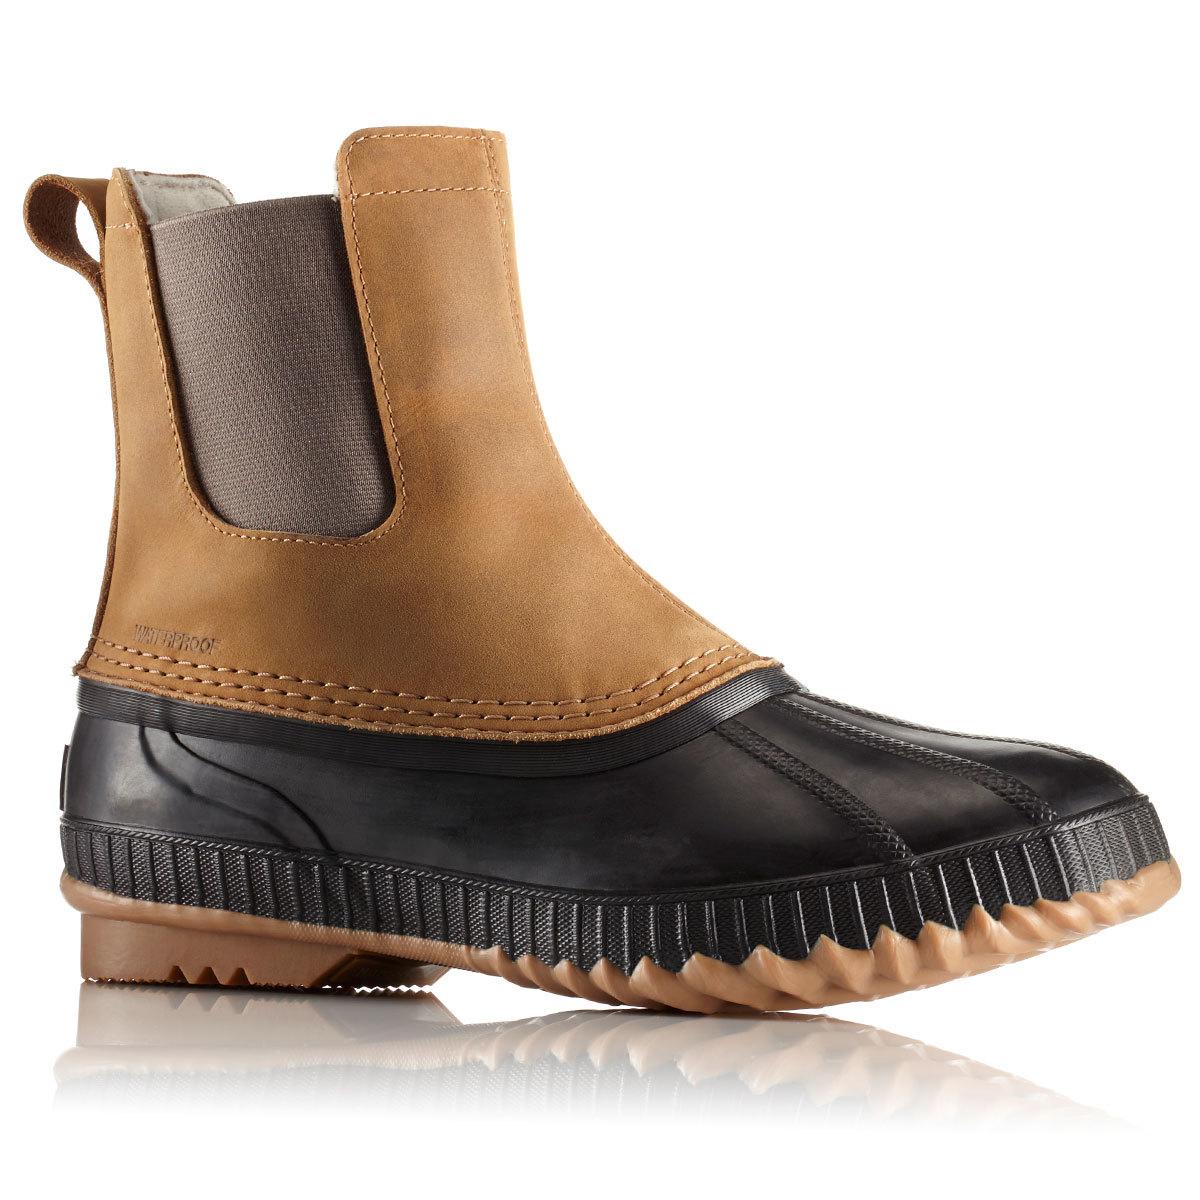 Sorel Men's 8 In. Cheyanne Ii Chelsea Waterproof Duck Boots, Elk - Brown, 13